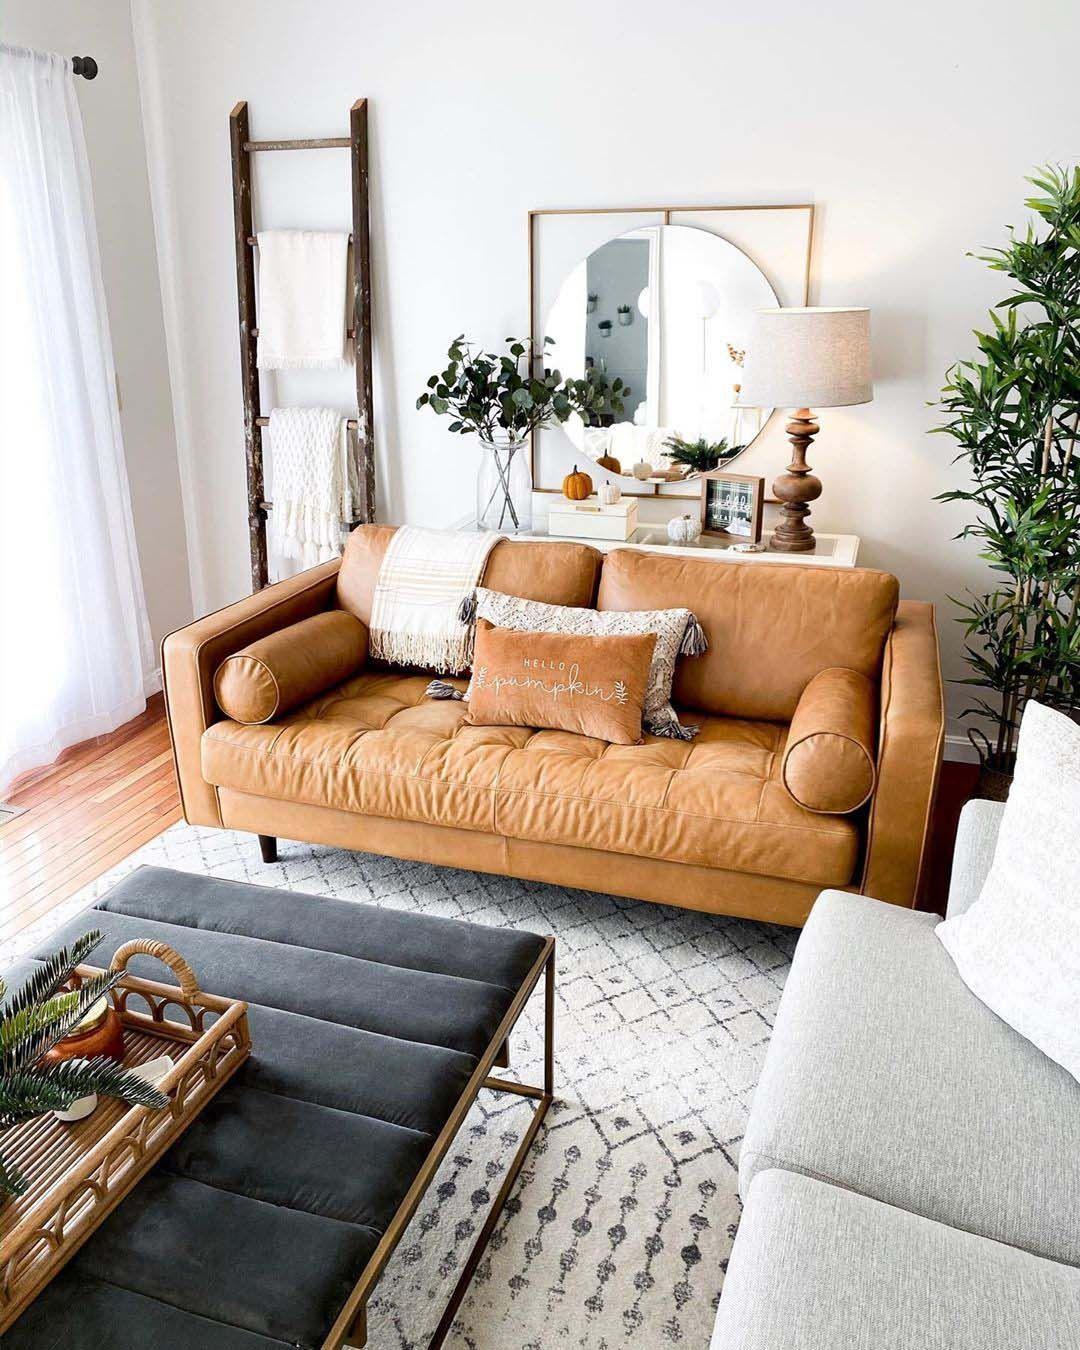 Corner Sofa Beds Futons Rexgarden In 2020 Loveseat Living Room Living Room Inspo Home Decor